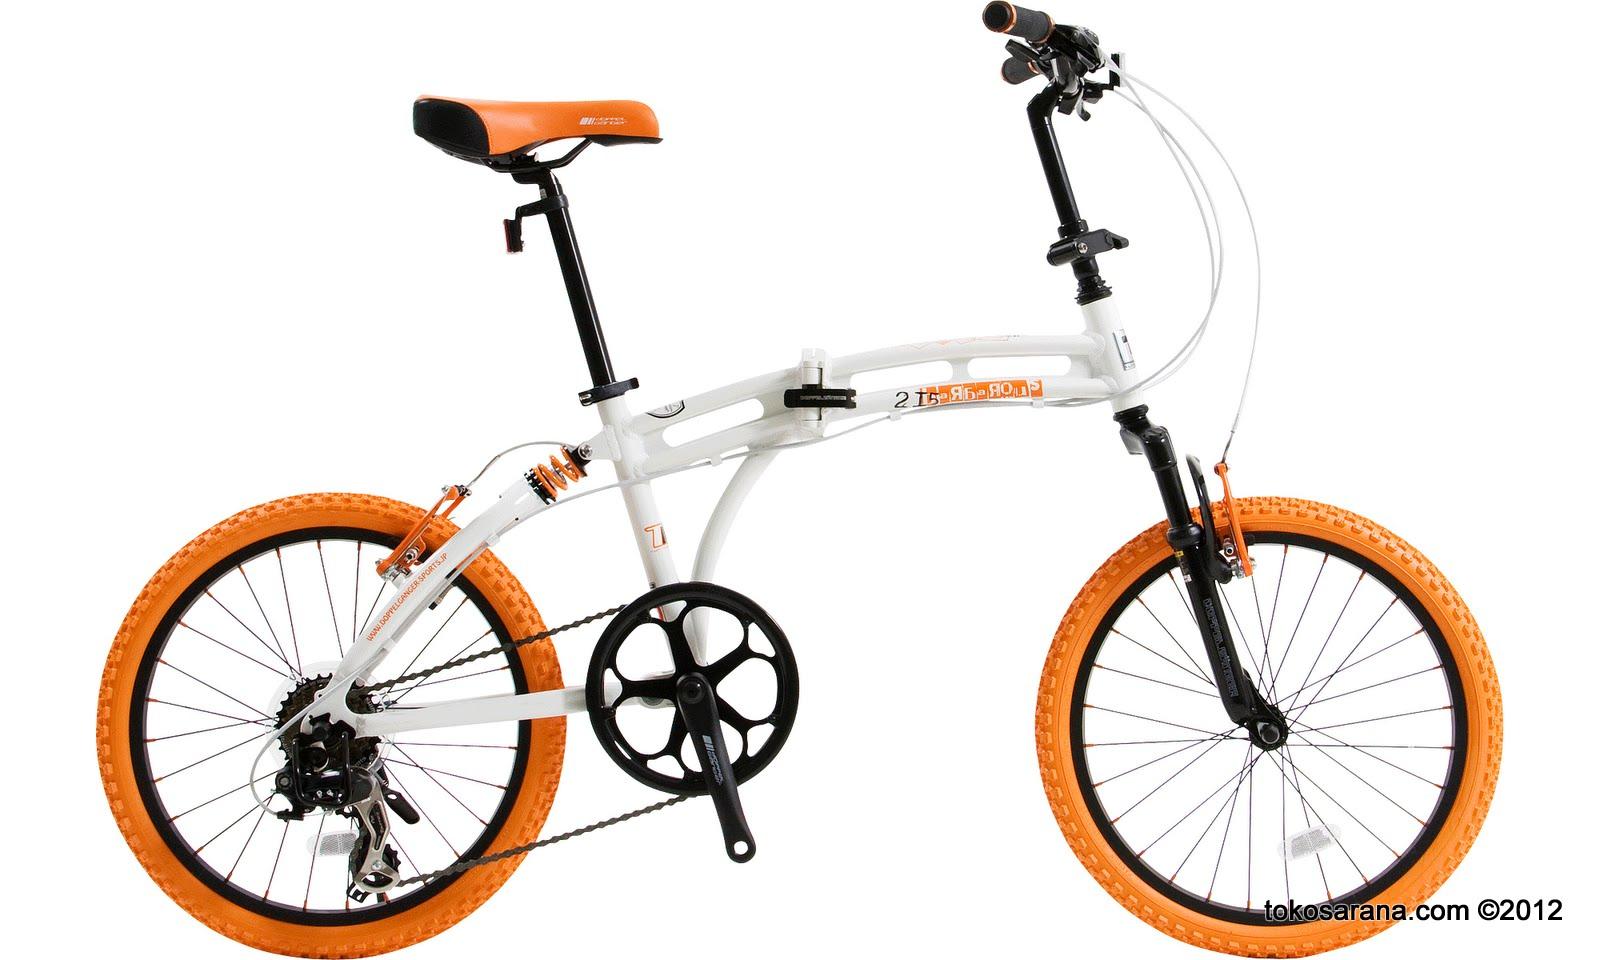 tokomagenta: A Showcase of Products: Sepeda Lipat